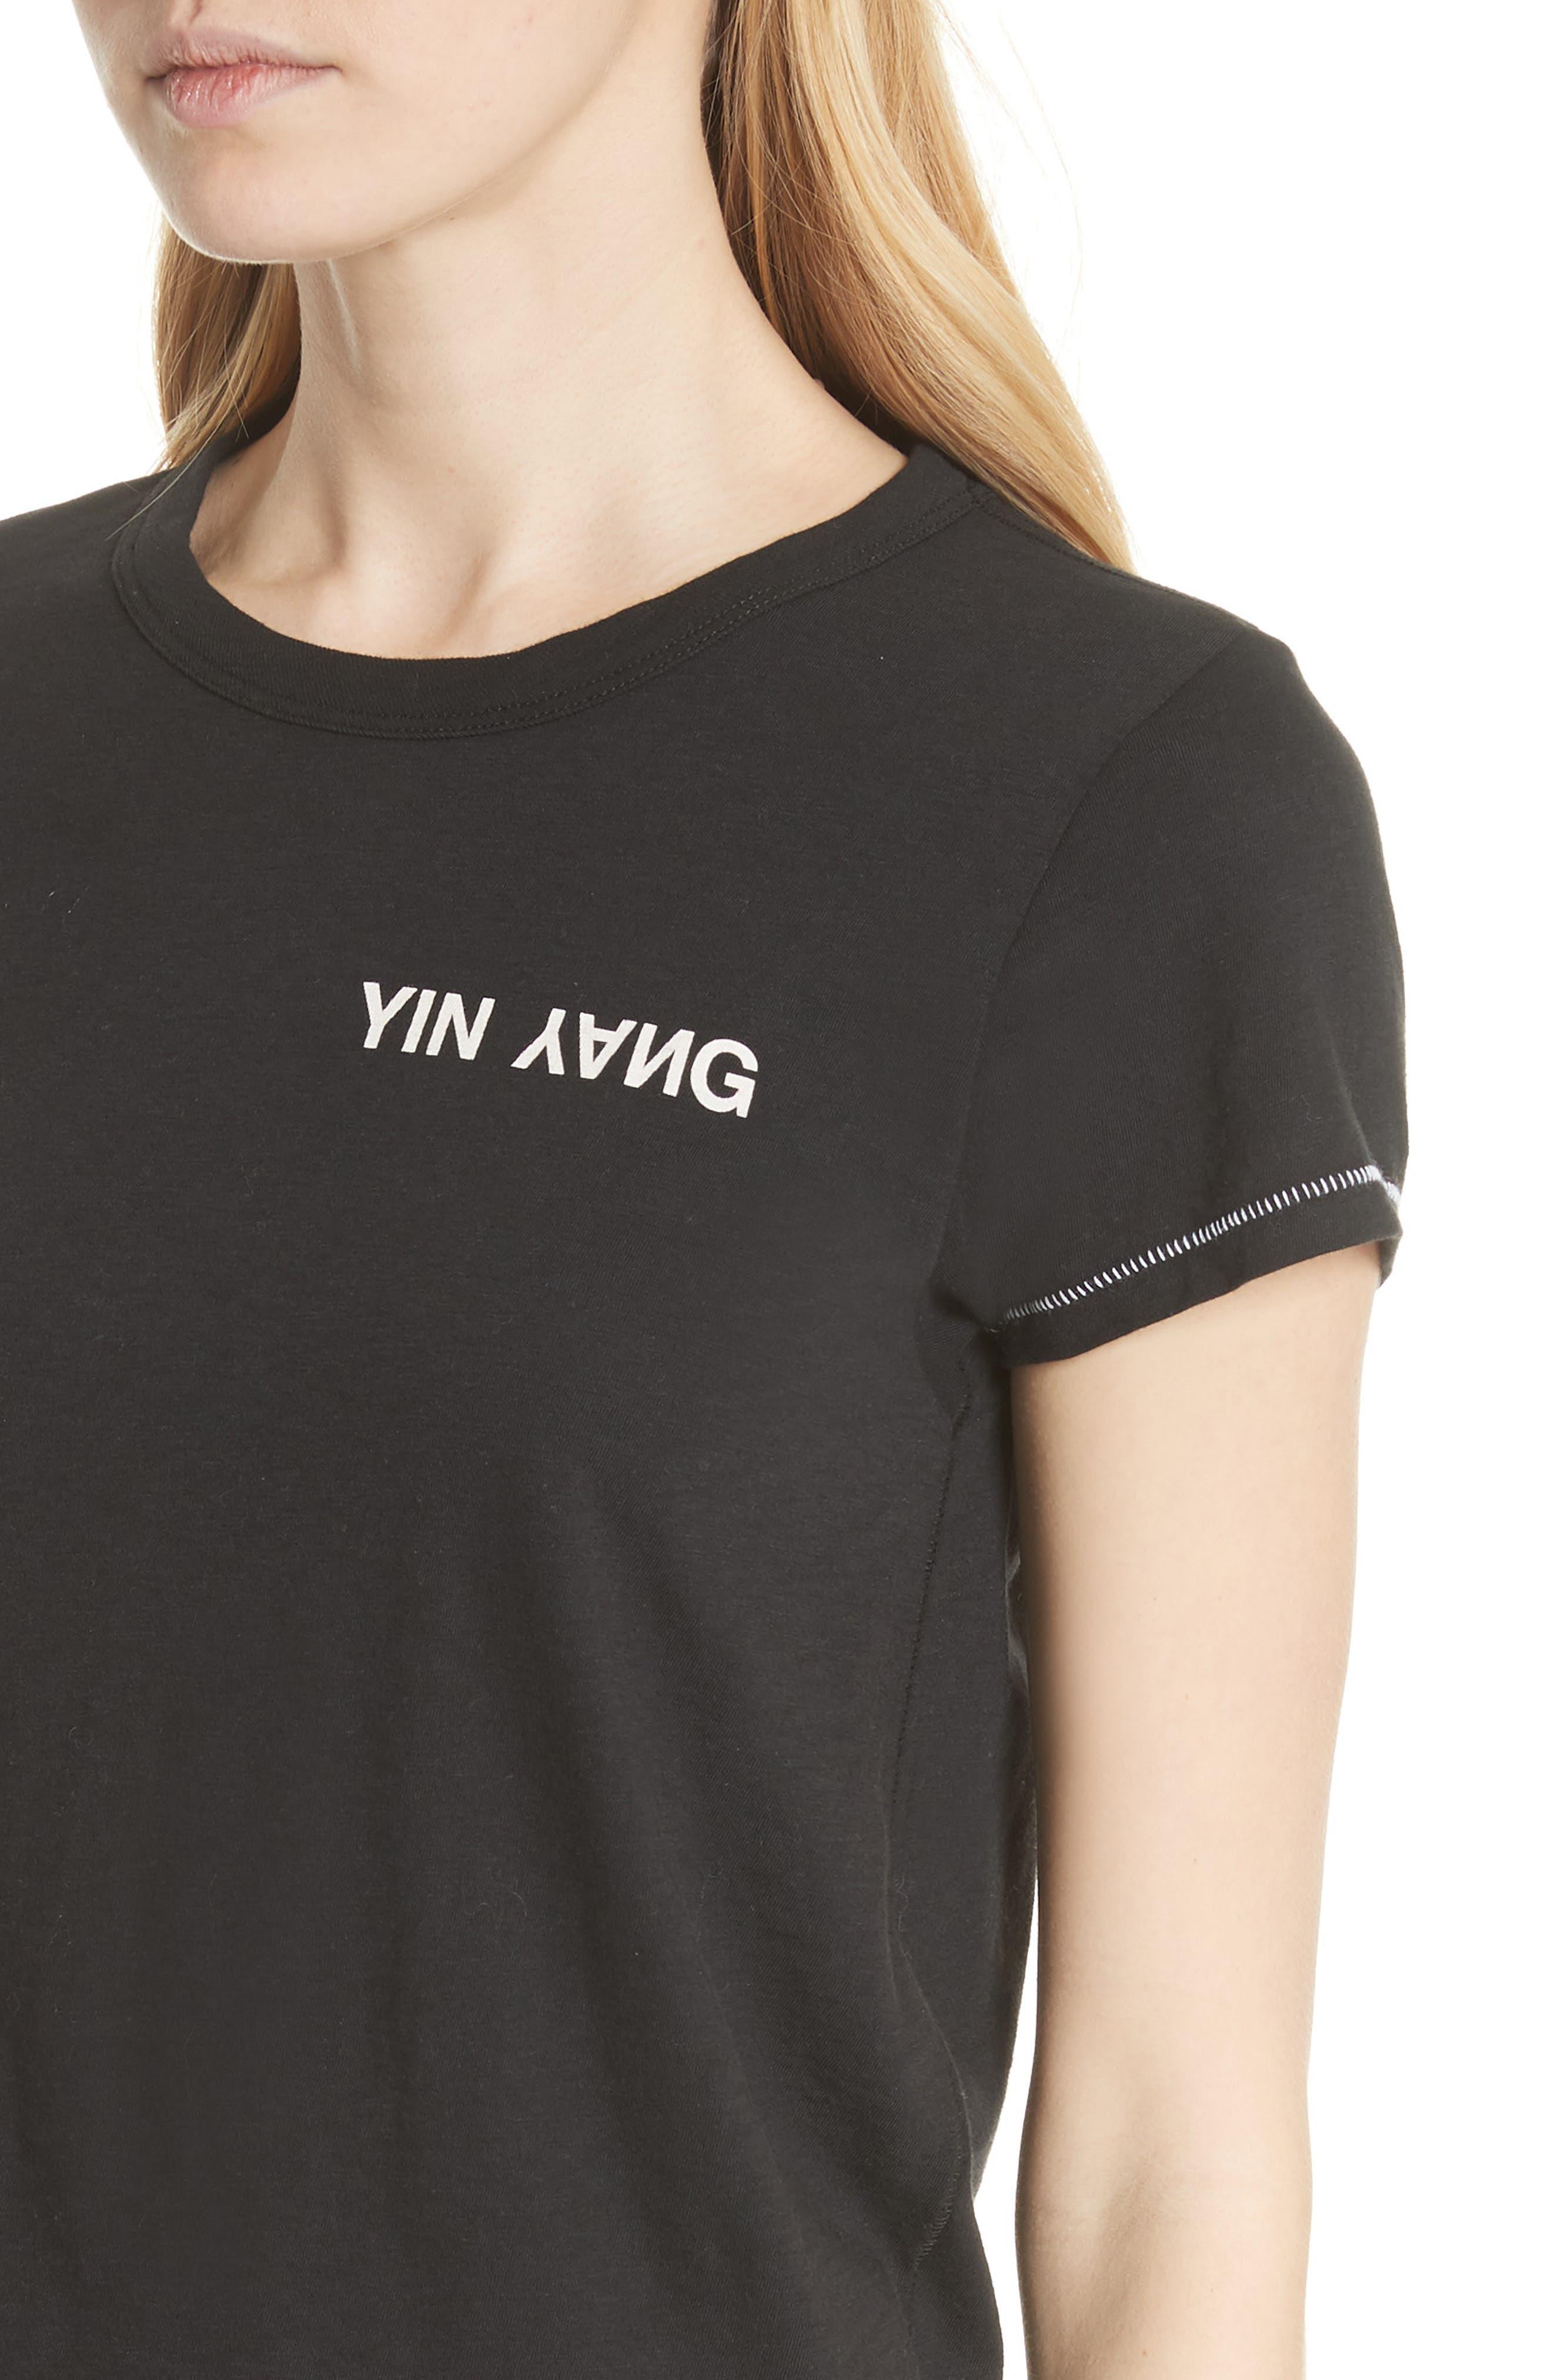 JEAN Yin Yang Tee,                             Alternate thumbnail 4, color,                             001